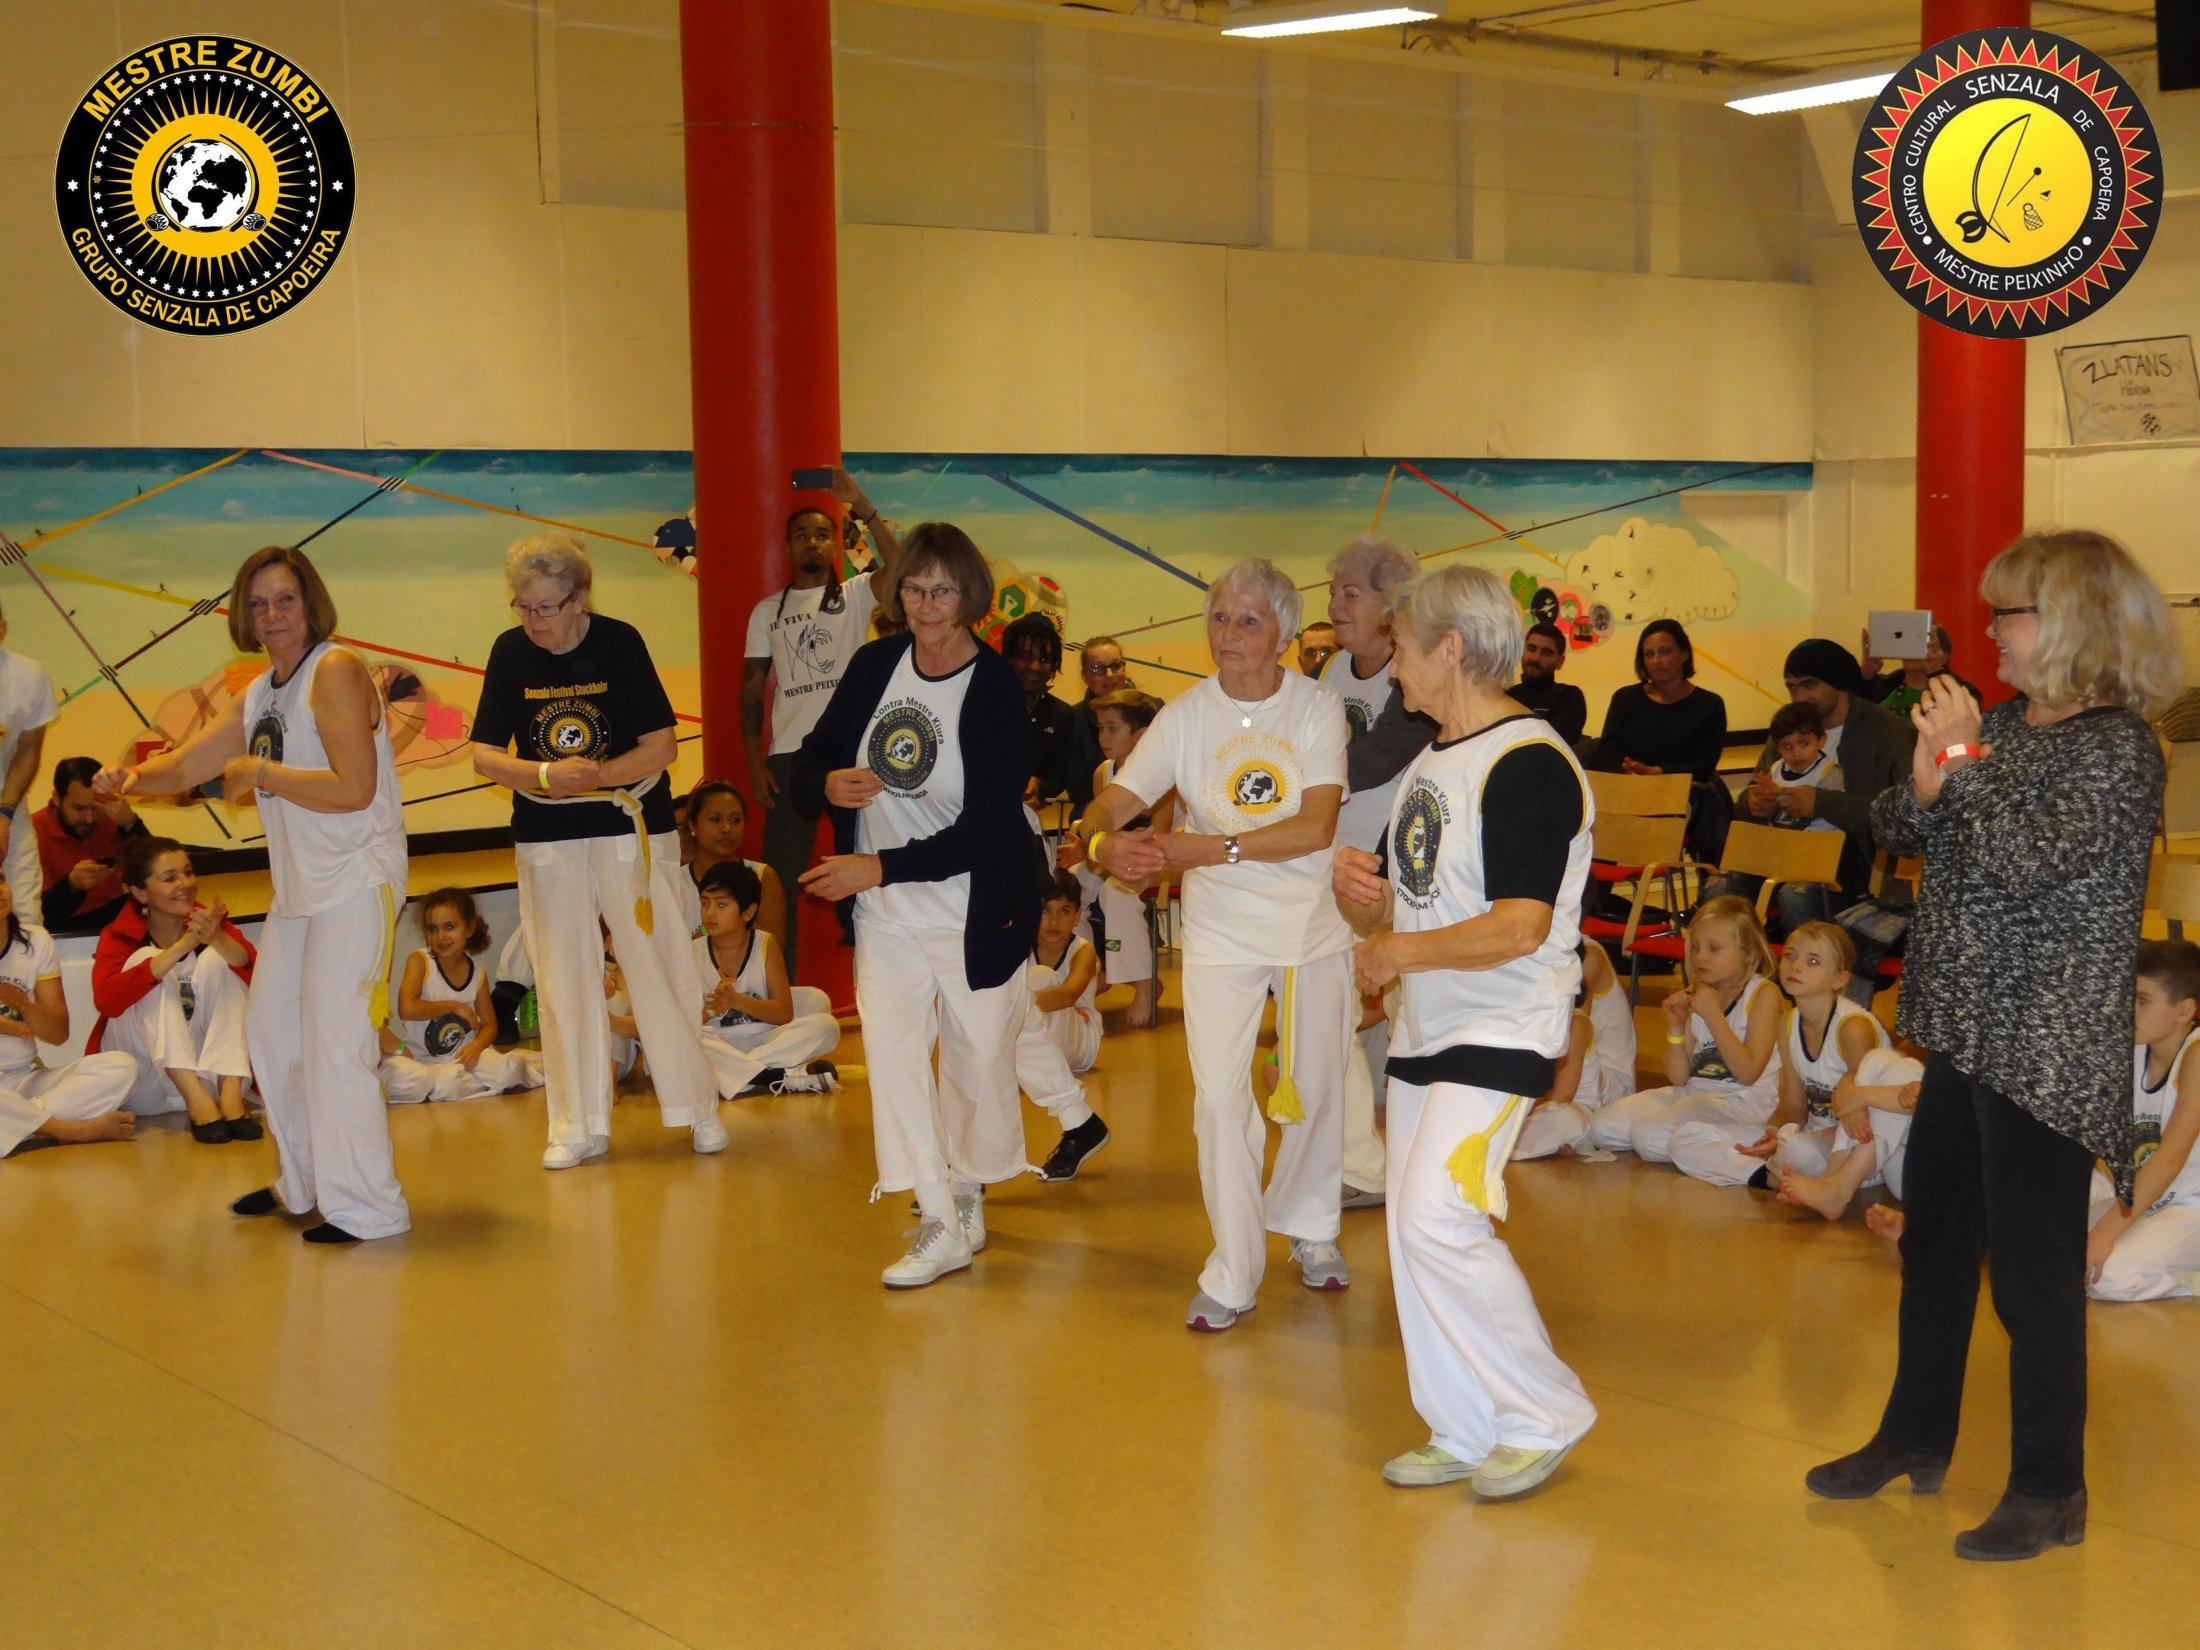 2013-12-14 - Capoeira 047